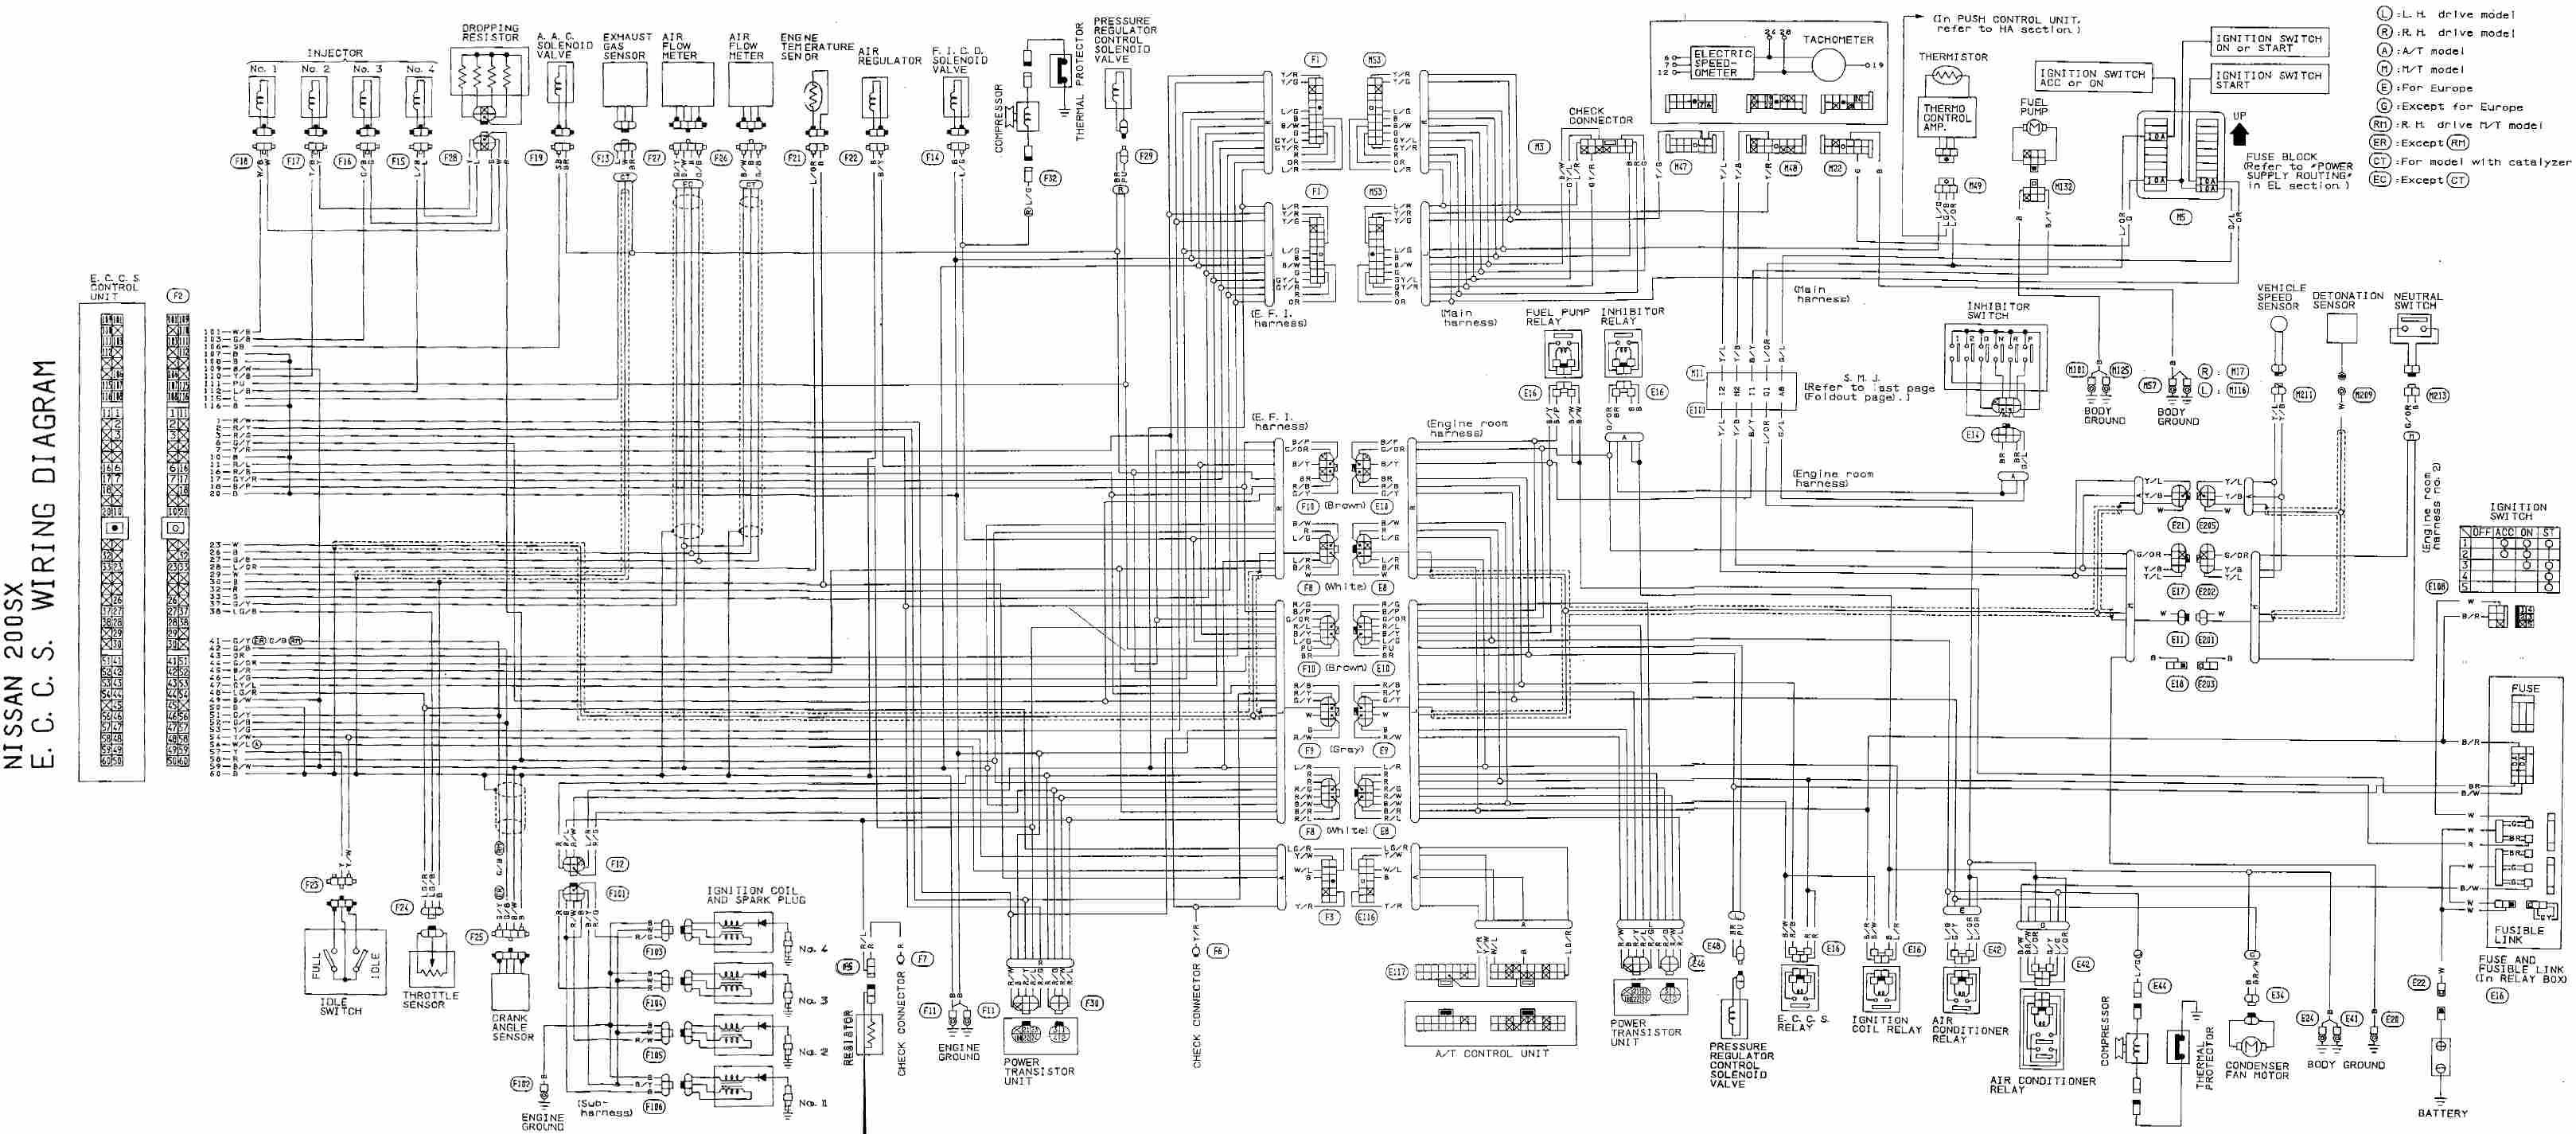 small resolution of 350z engine wiring diagram wiring diagrams2003 nissan 350z wiring diagram wiring diagram box 350z engine wiring